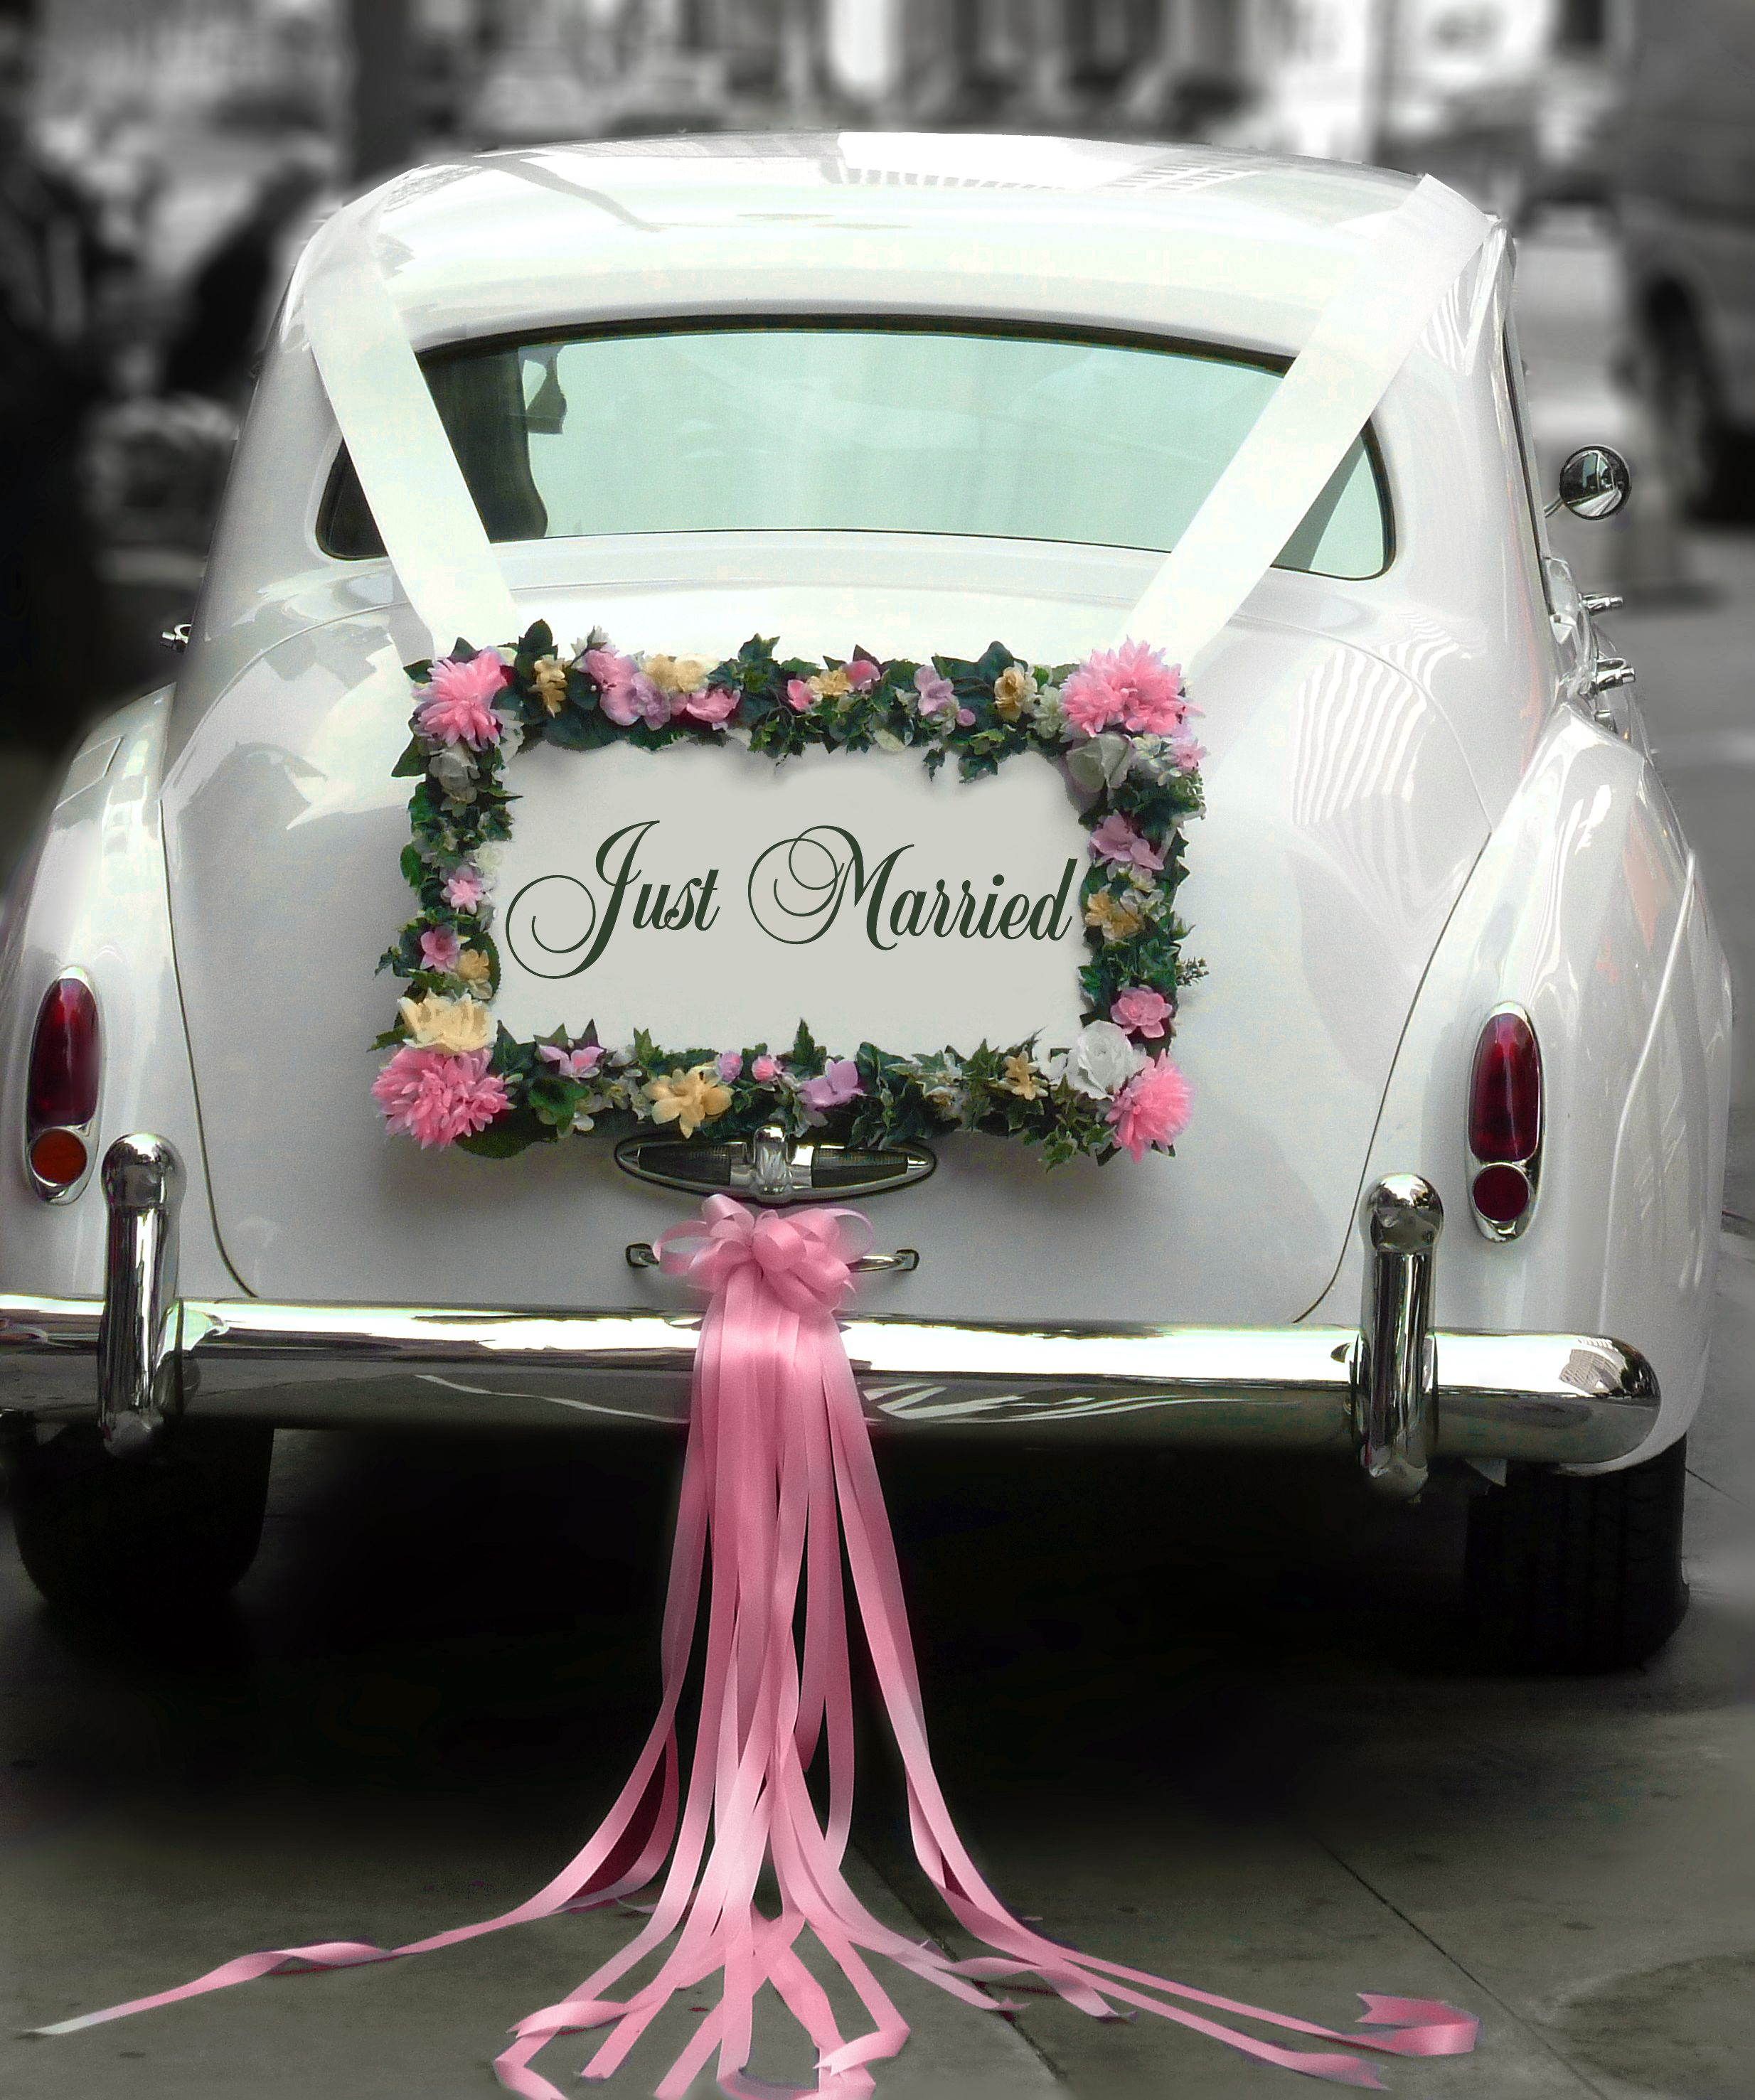 Our 1962 white vintage rolls royce lwb wedding getaway car with a our 1962 white vintage rolls royce lwb wedding getaway car with a just married sign junglespirit Gallery